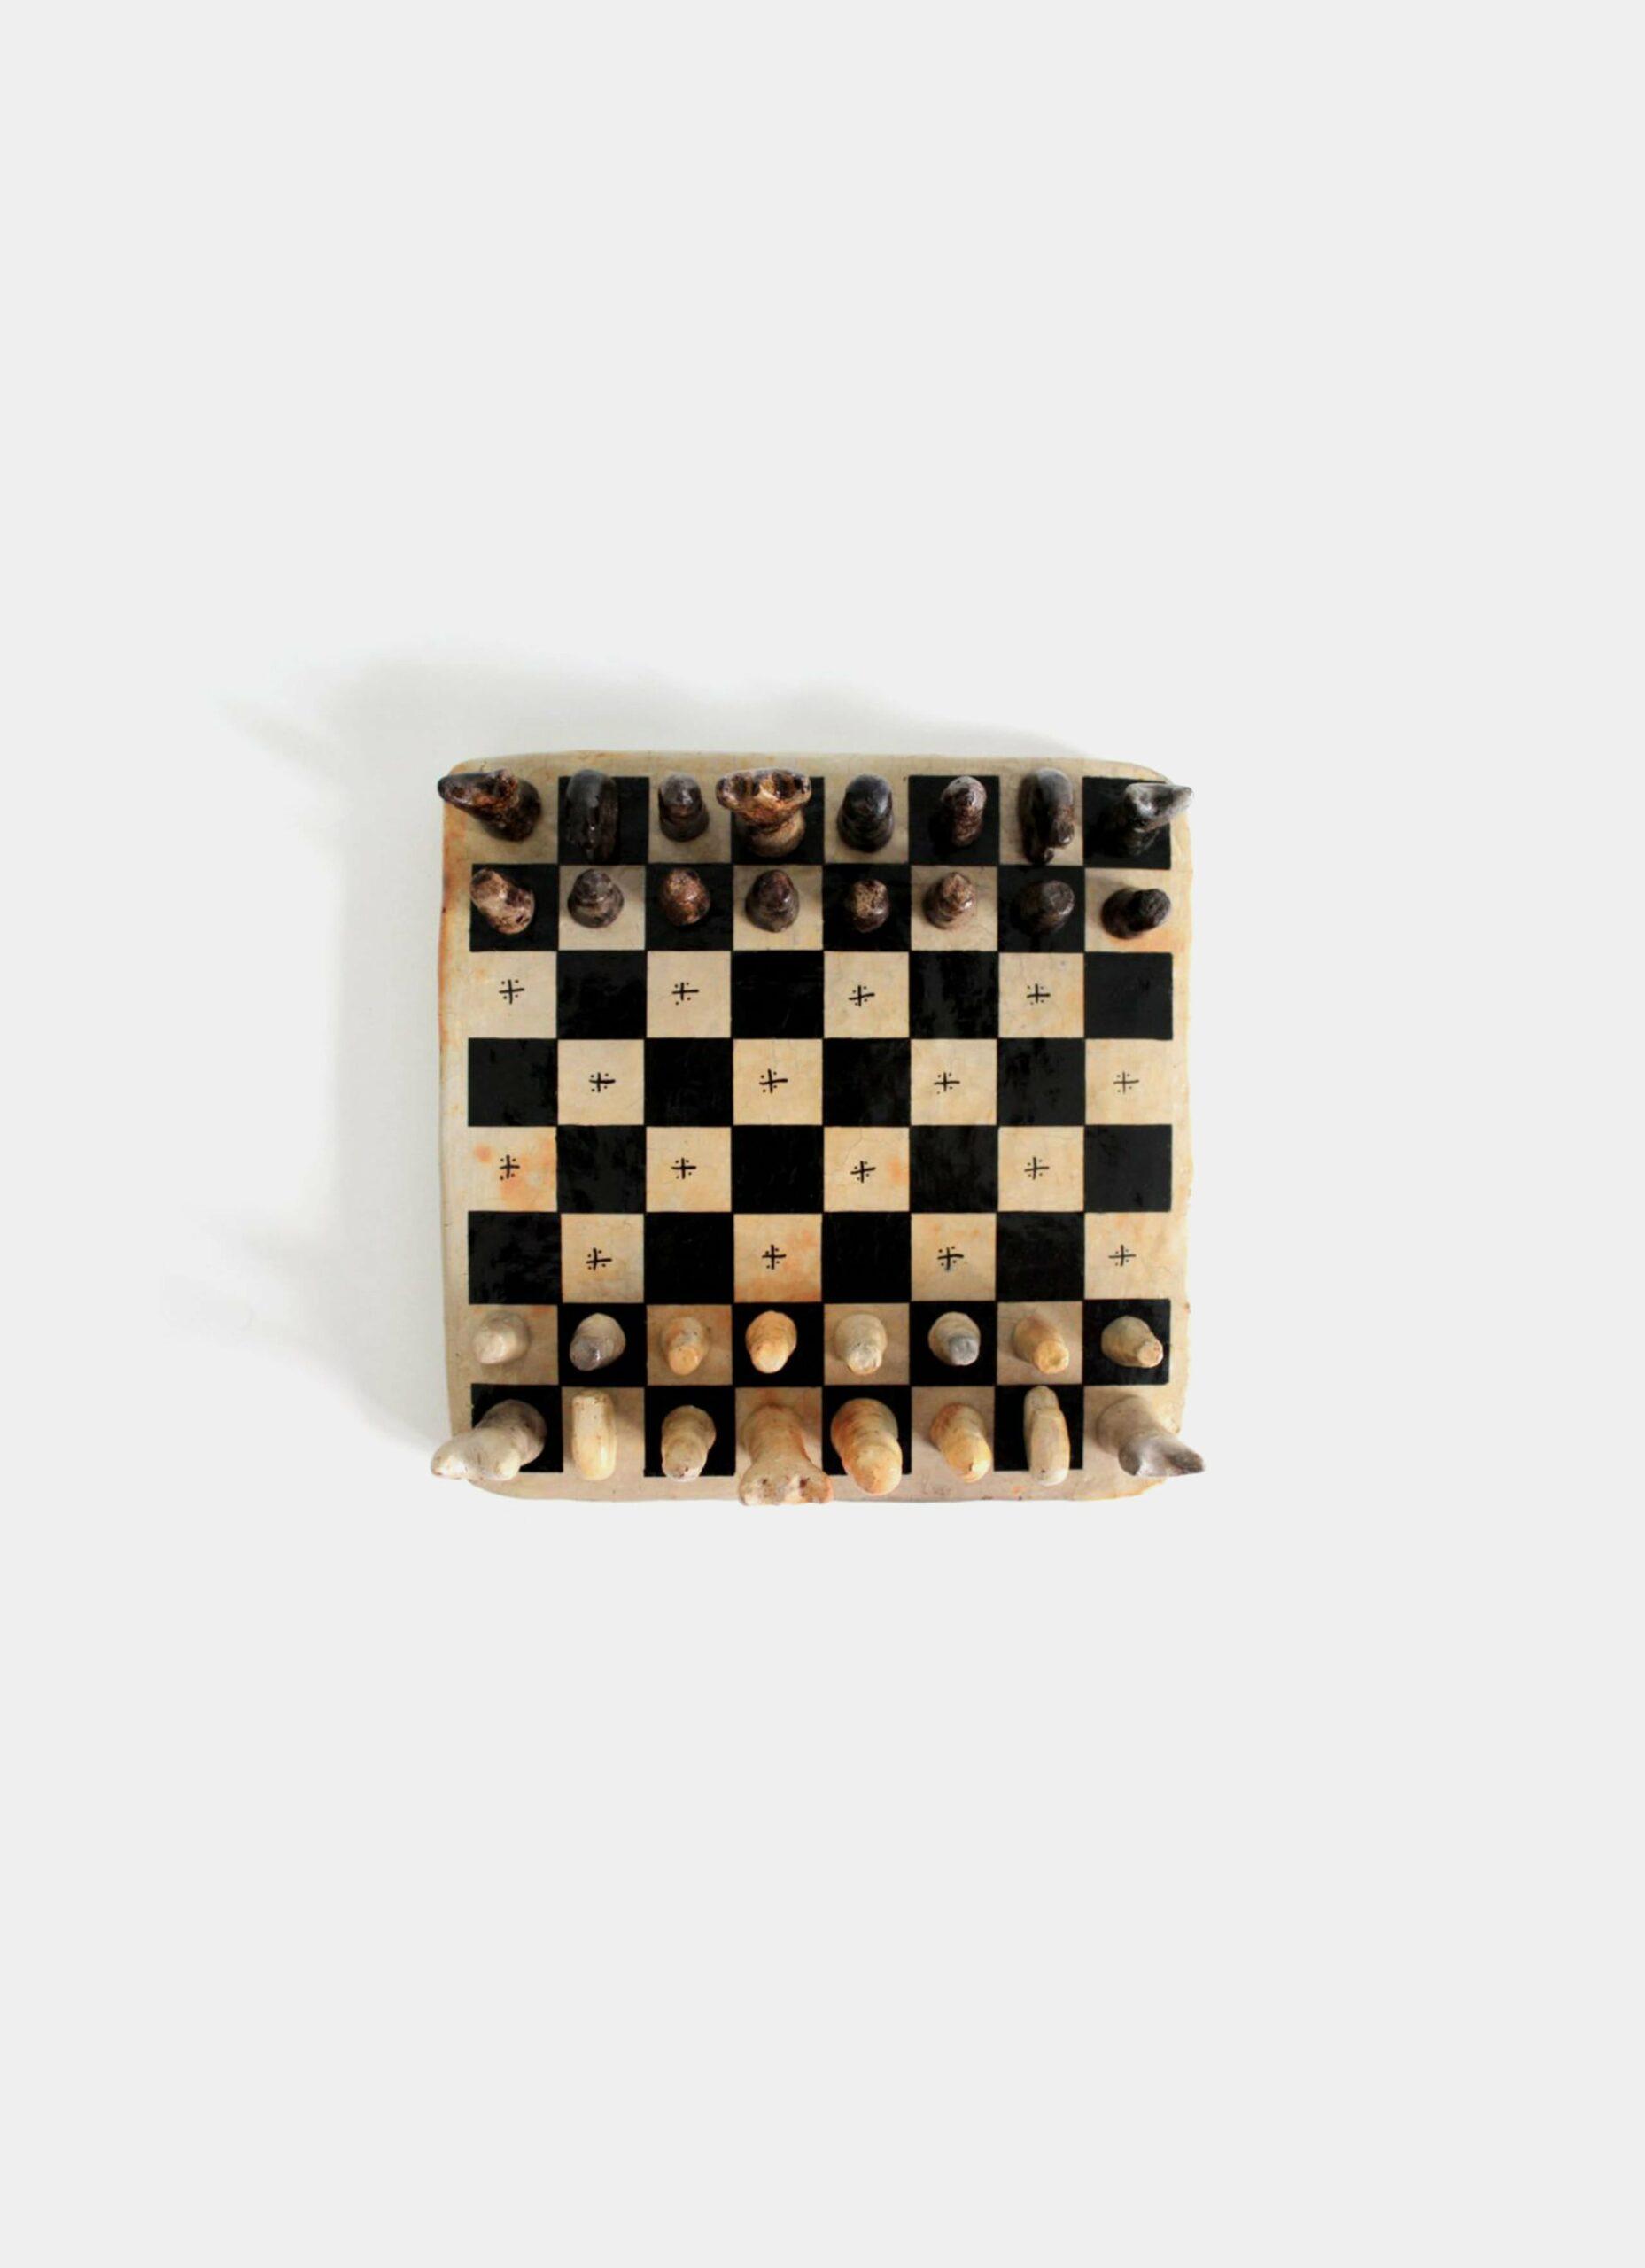 Flayou - Chich-Bich - Terracotta - Chess black